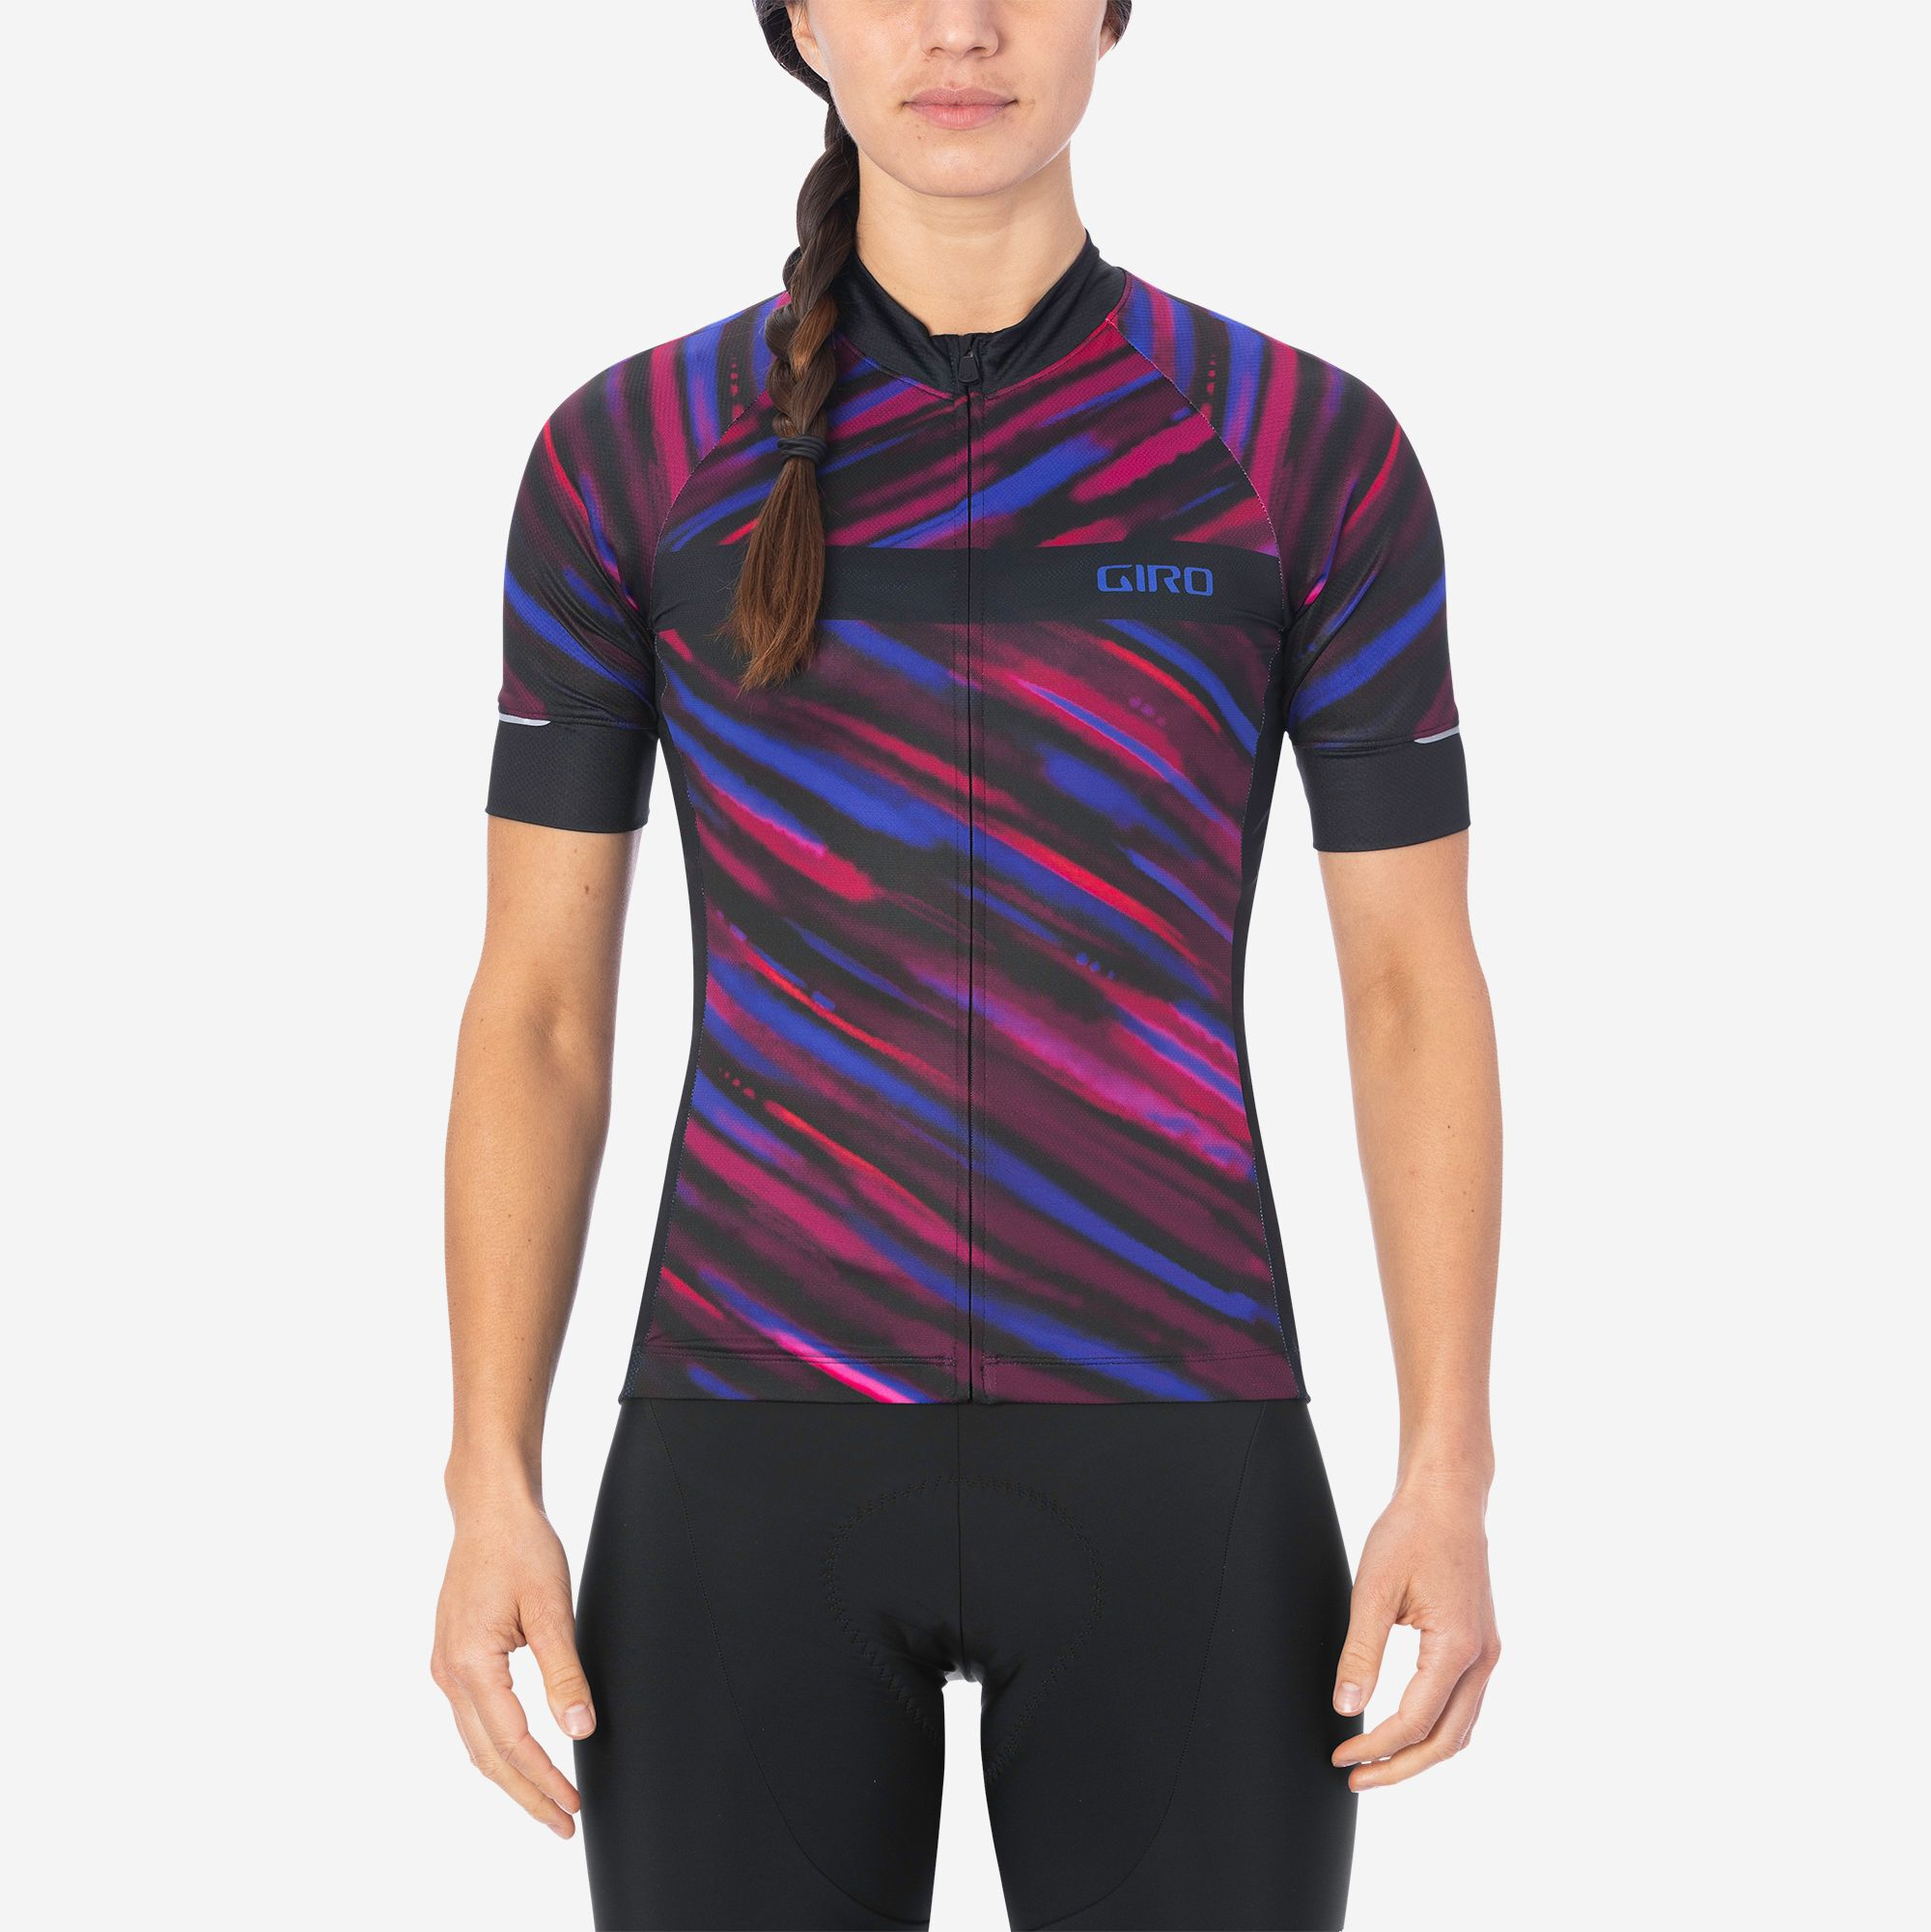 Giro Women/'s Chrono Sport Pink Black Jersey Size M New